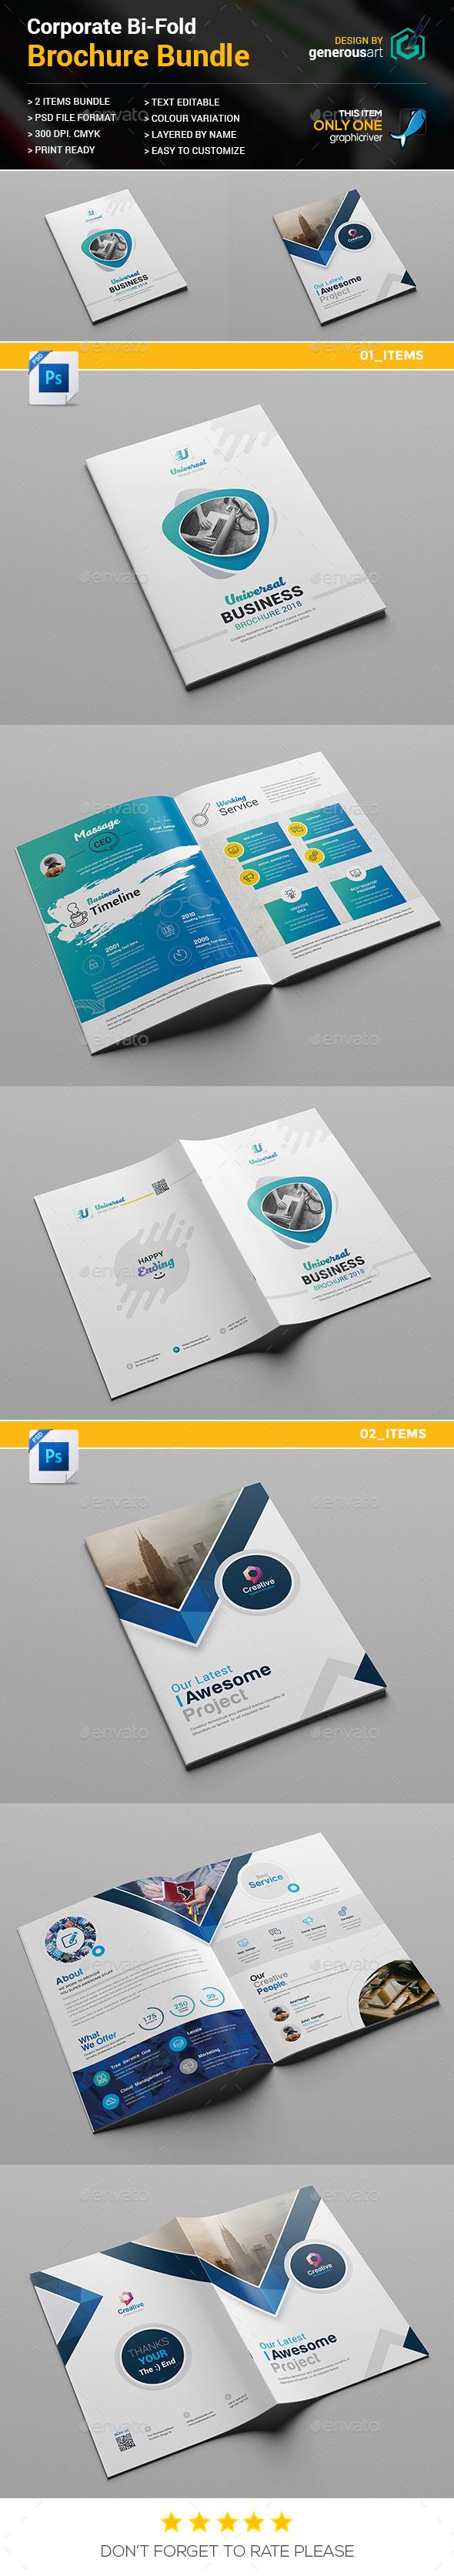 Bi-Fold Brochure Bundle 2 in 1 - Brochures Print Templates